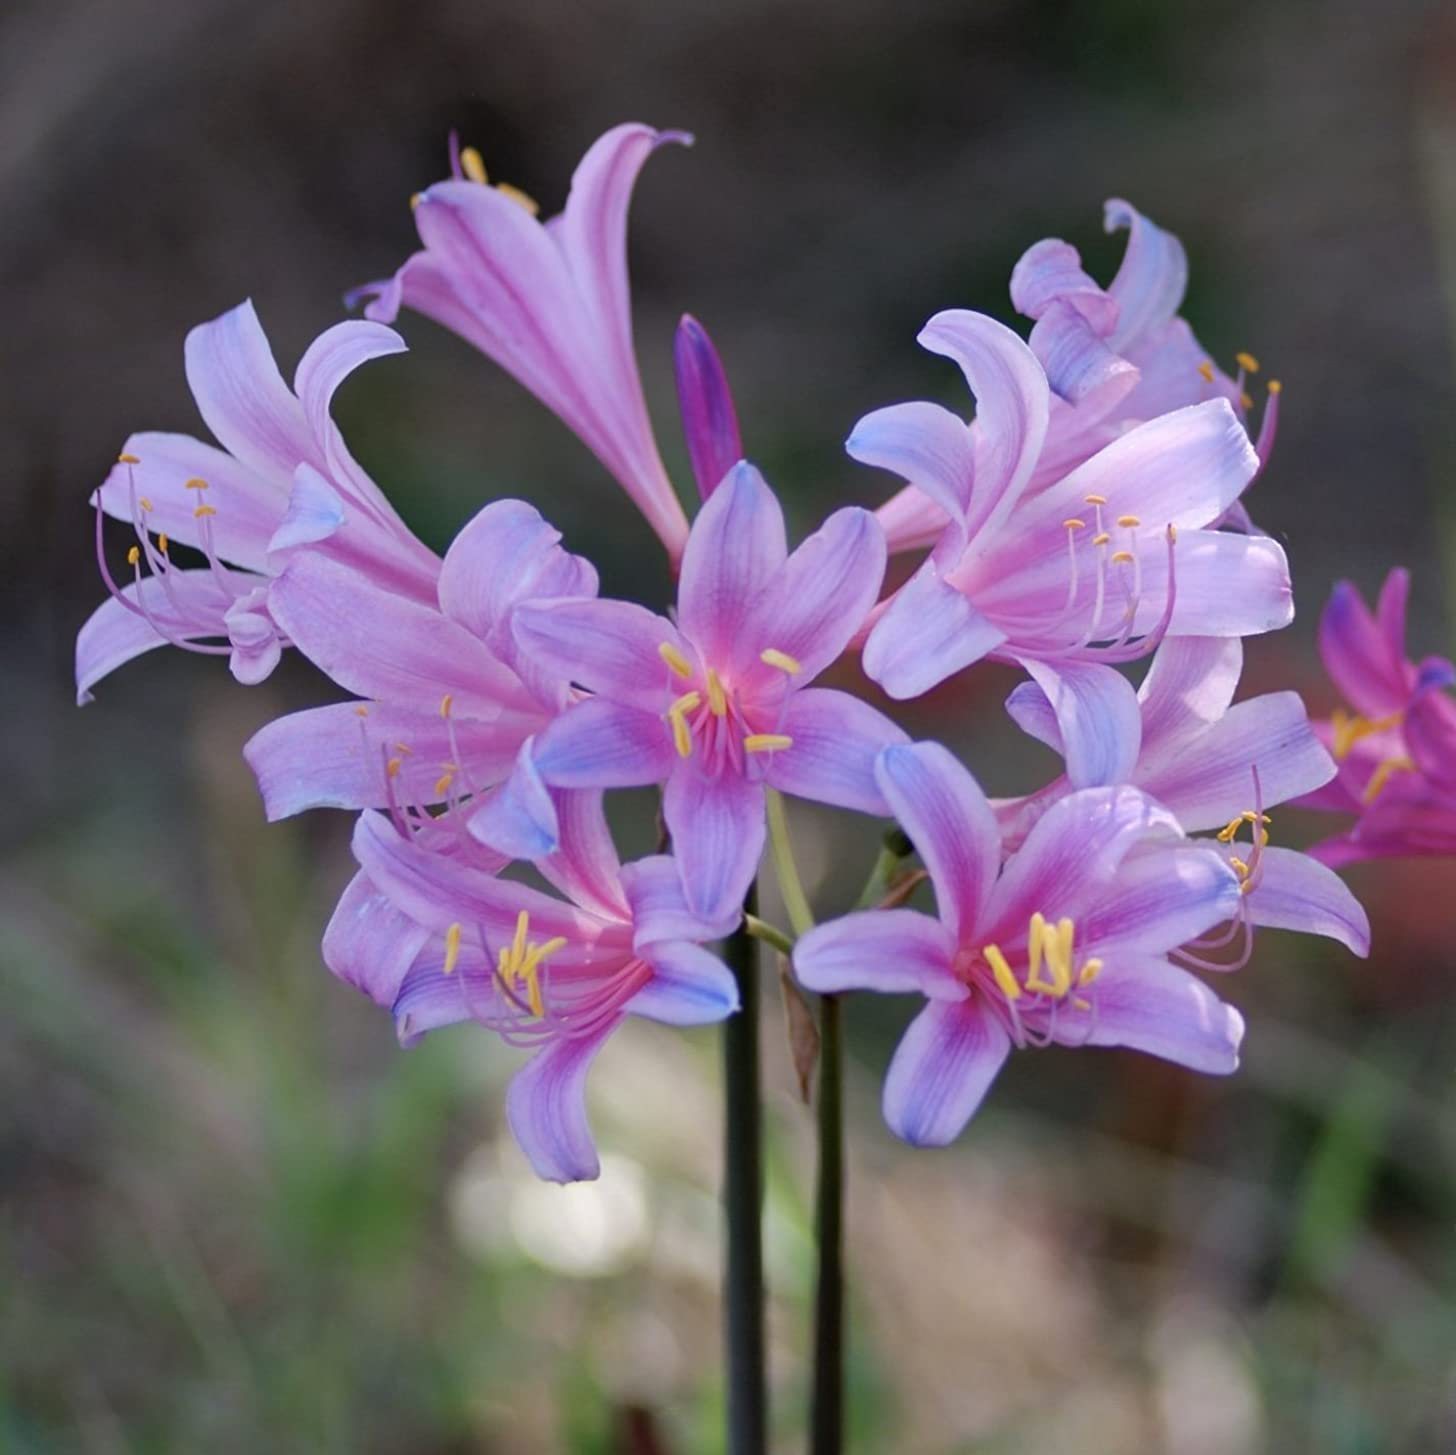 Mytree Lycoris Electric Blue Sprengeri - Surprise Lilies - 2 Large Bulb - 12+ cm Ships